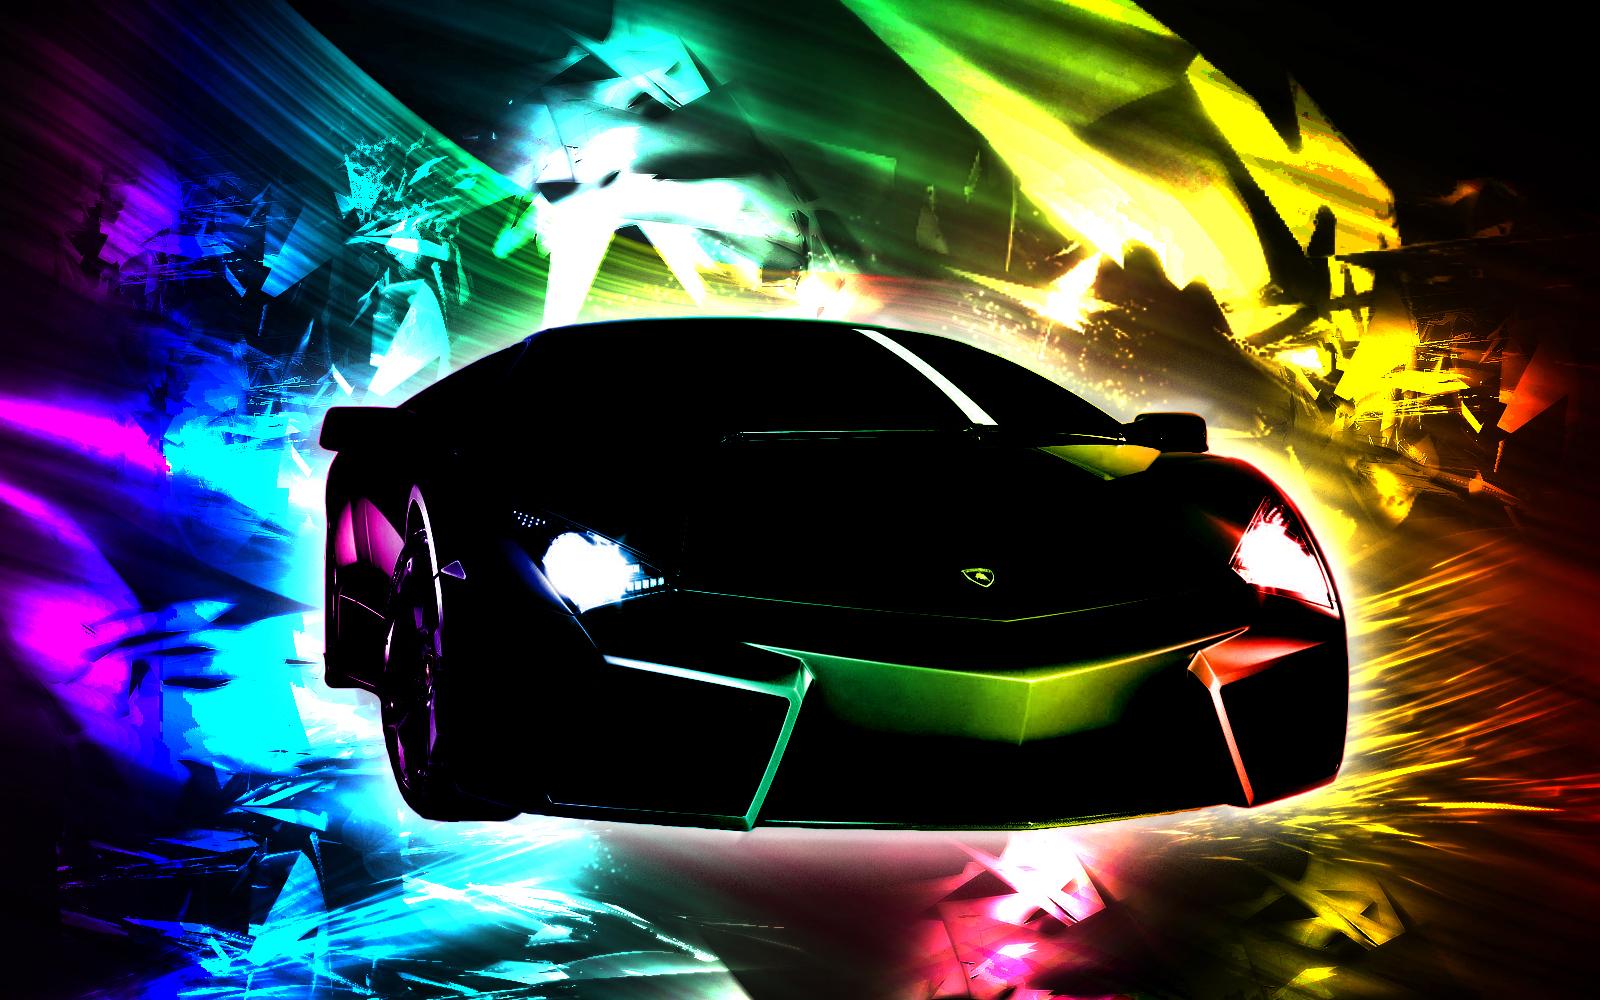 Hd Car Wallpapers Lamborghini Reventon Wallpaper